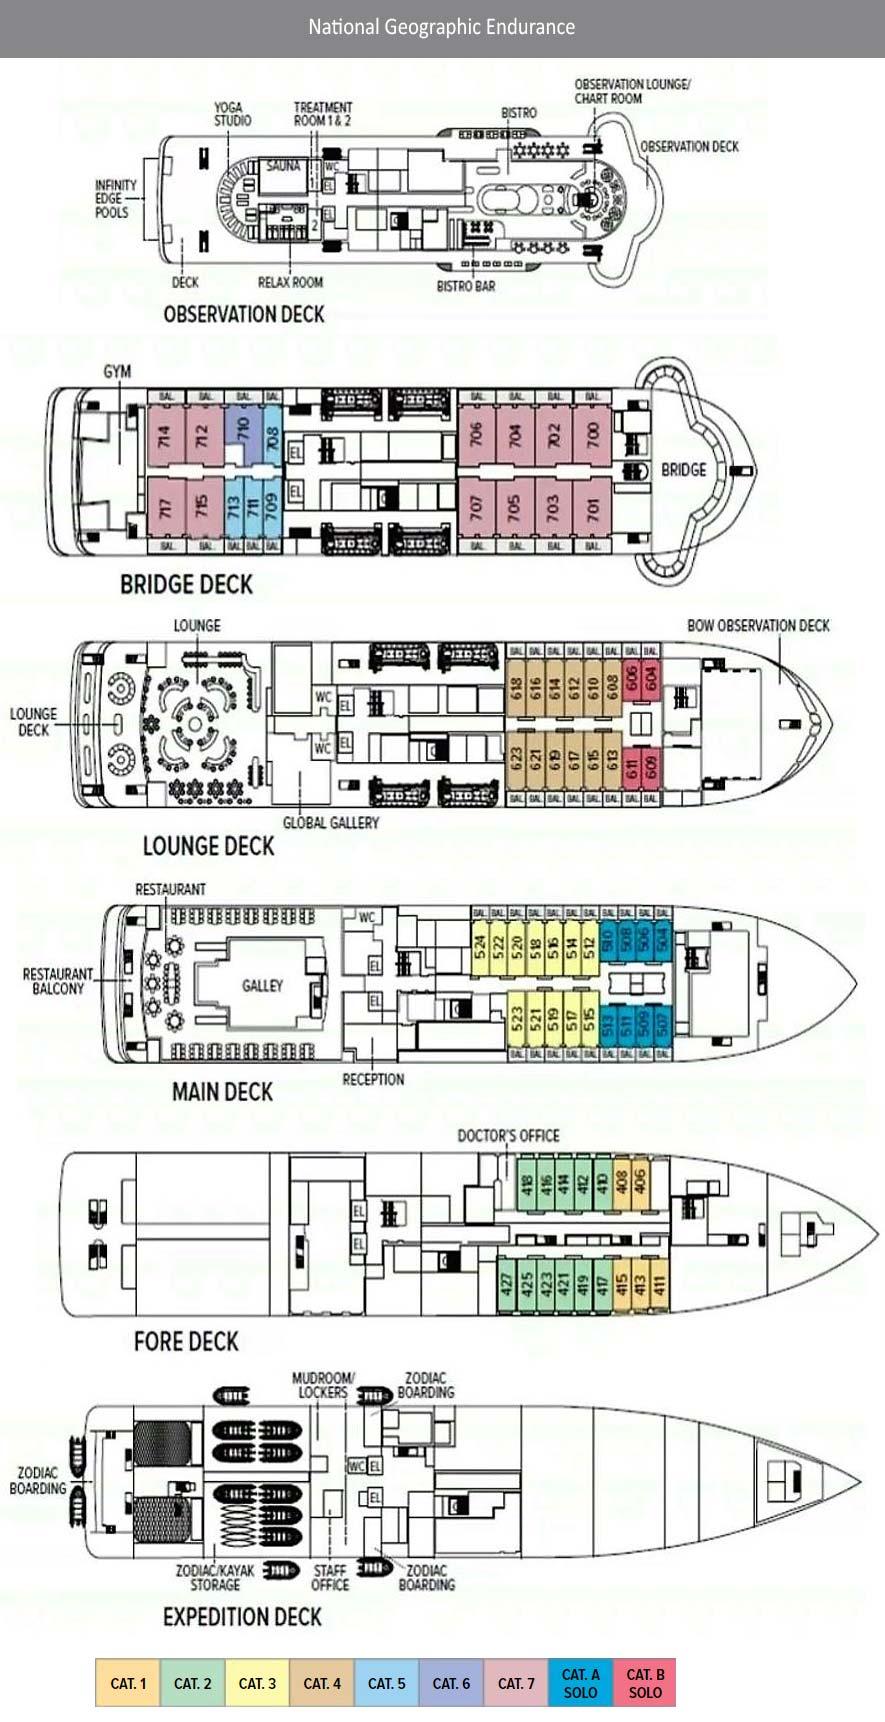 national-geographic-endurance-deck-plan